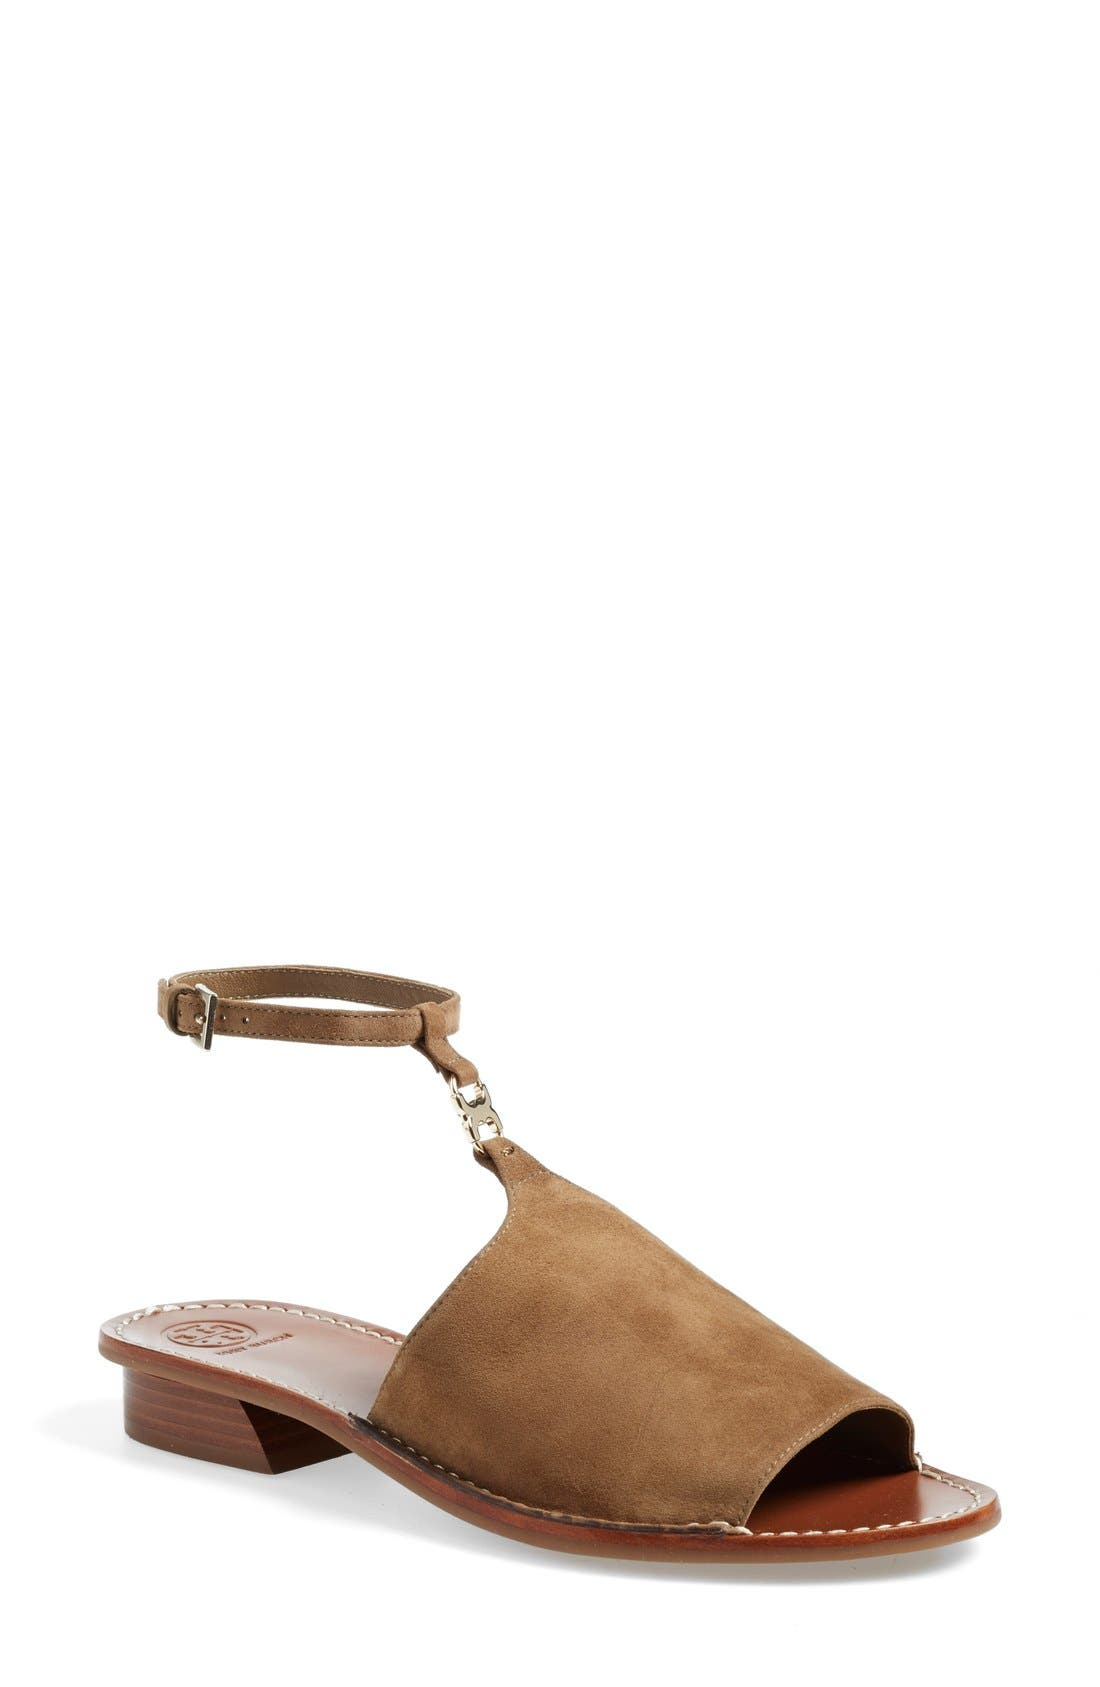 'Gemini Link' Ankle Strap Sandal, Main, color, 037